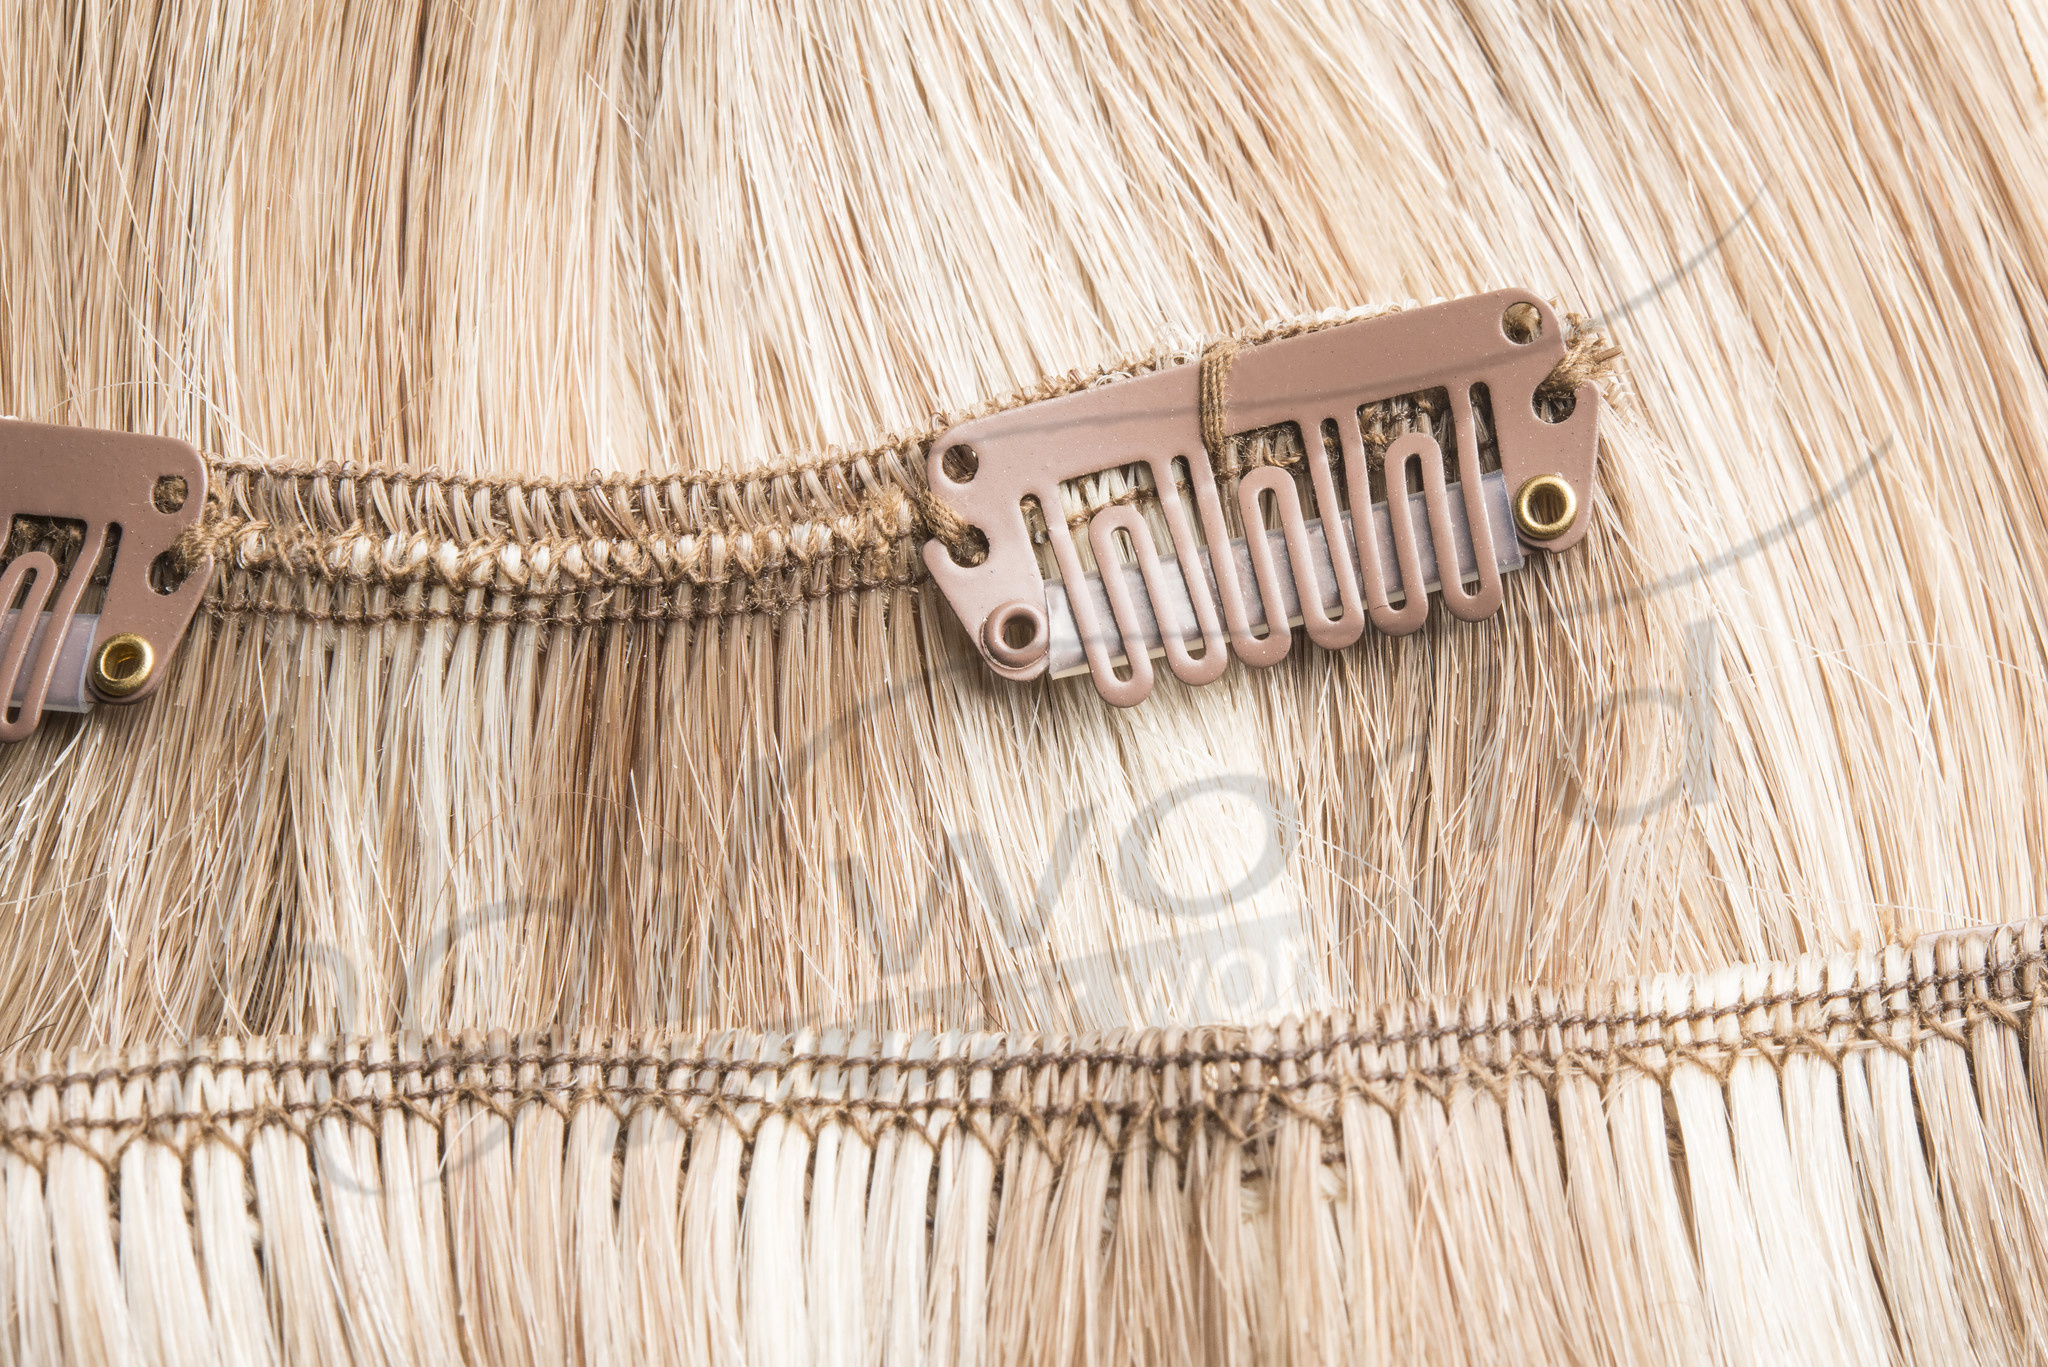 RedFox Clip-in Extensions - Straight - #27/613 Dark Blonde/ Light Blonde